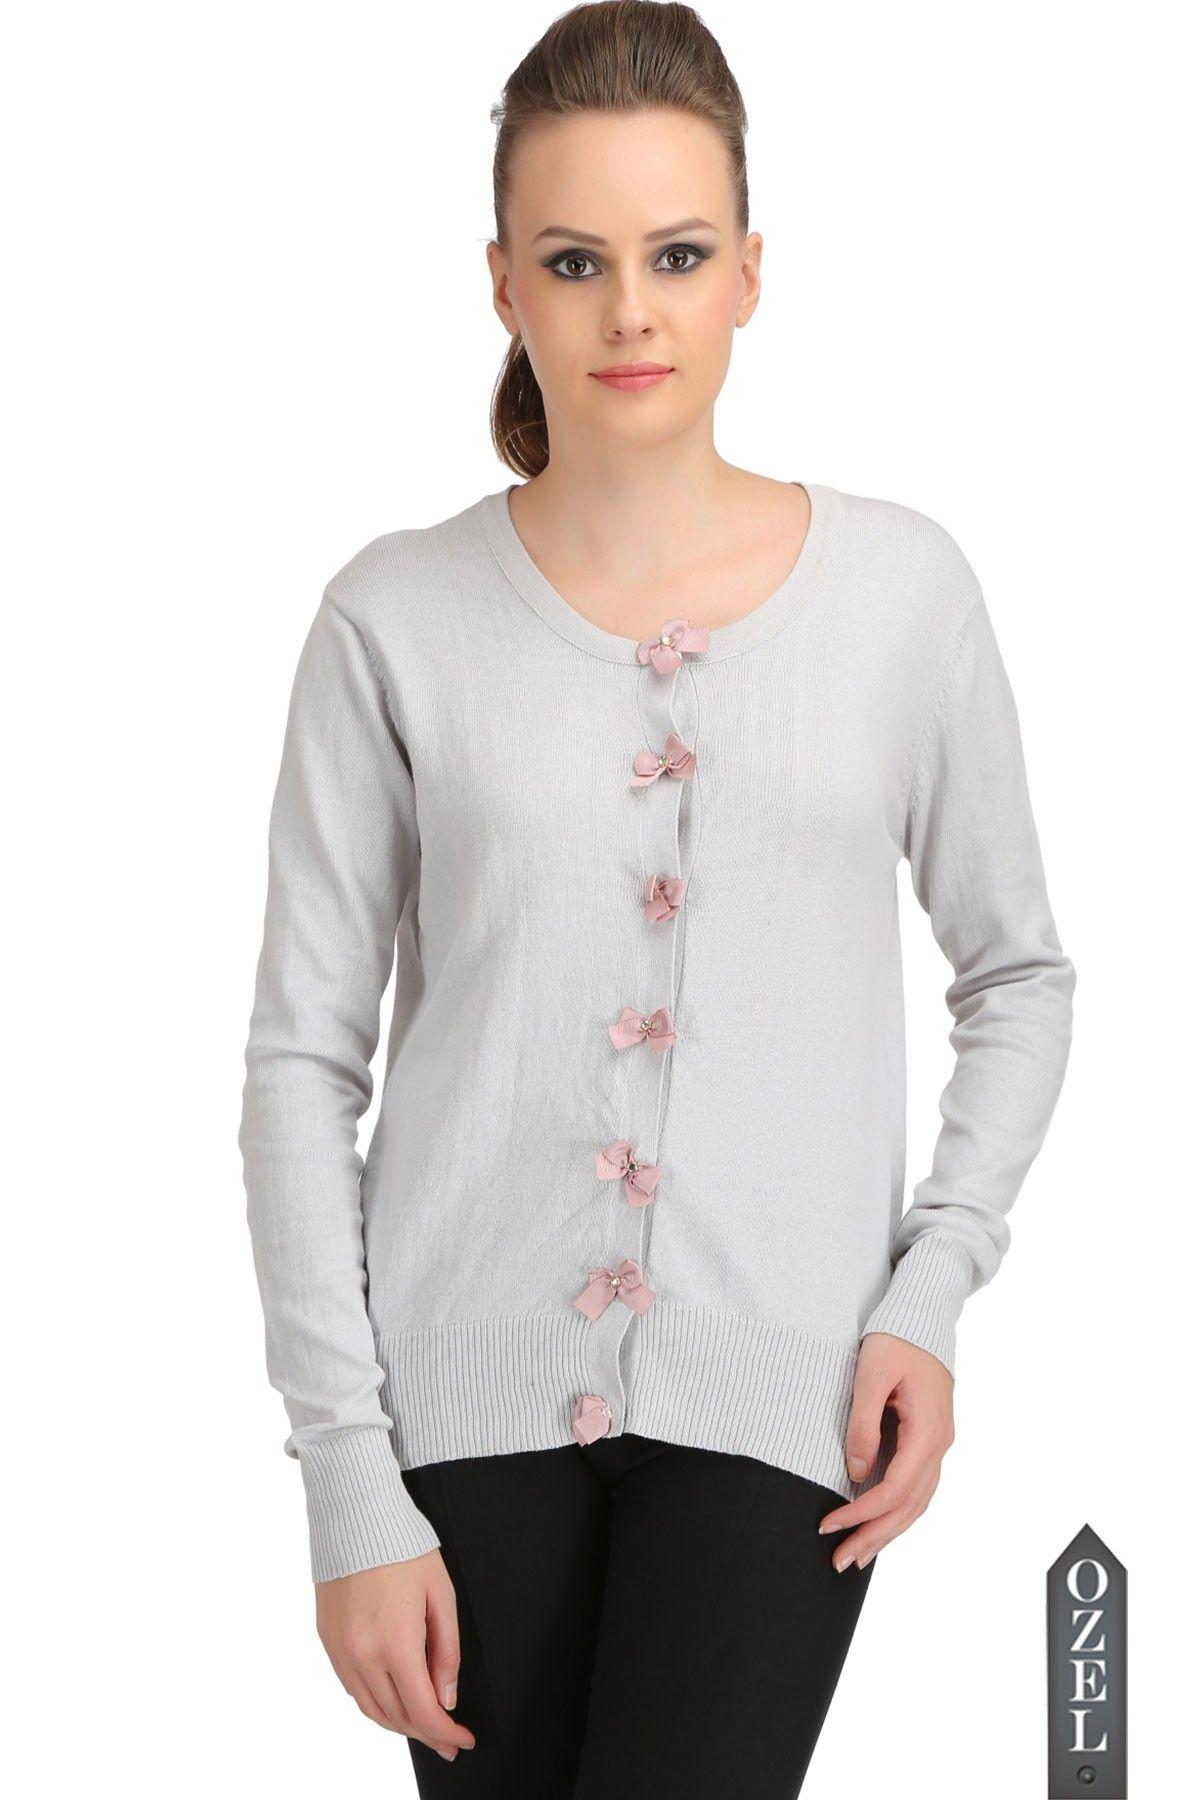 0d43380c24 Sweater Dress Online India